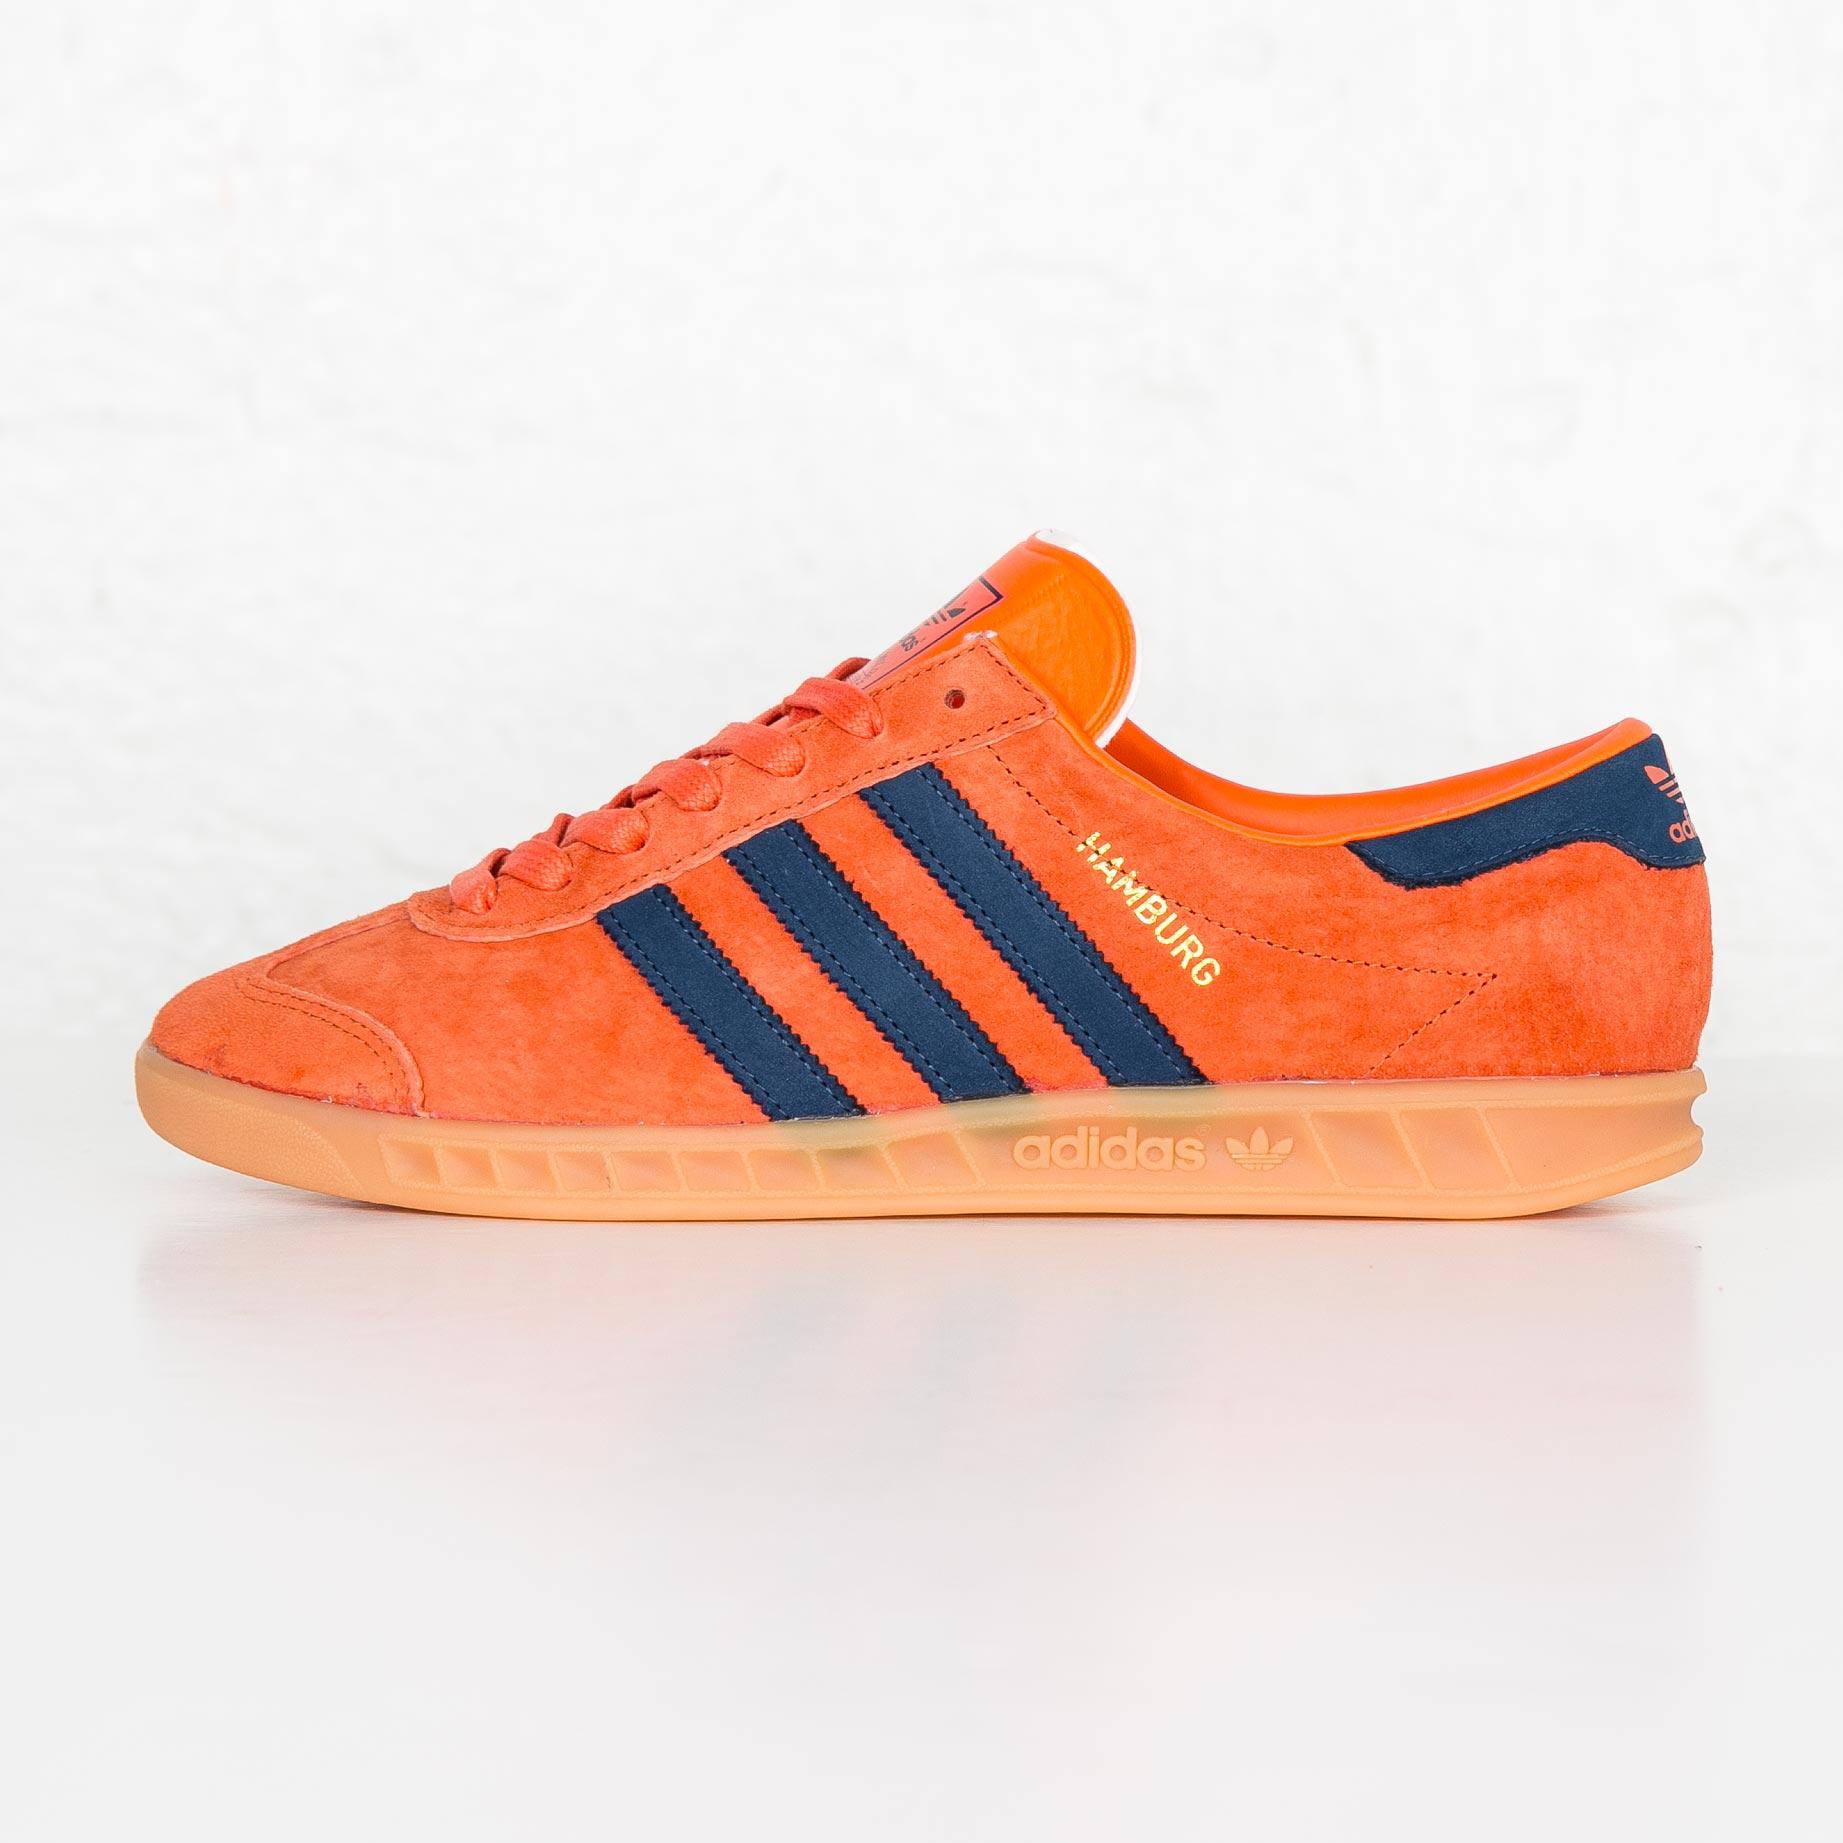 adidas Hamburg - S74837 - SNS   sneakers & streetwear online since ...